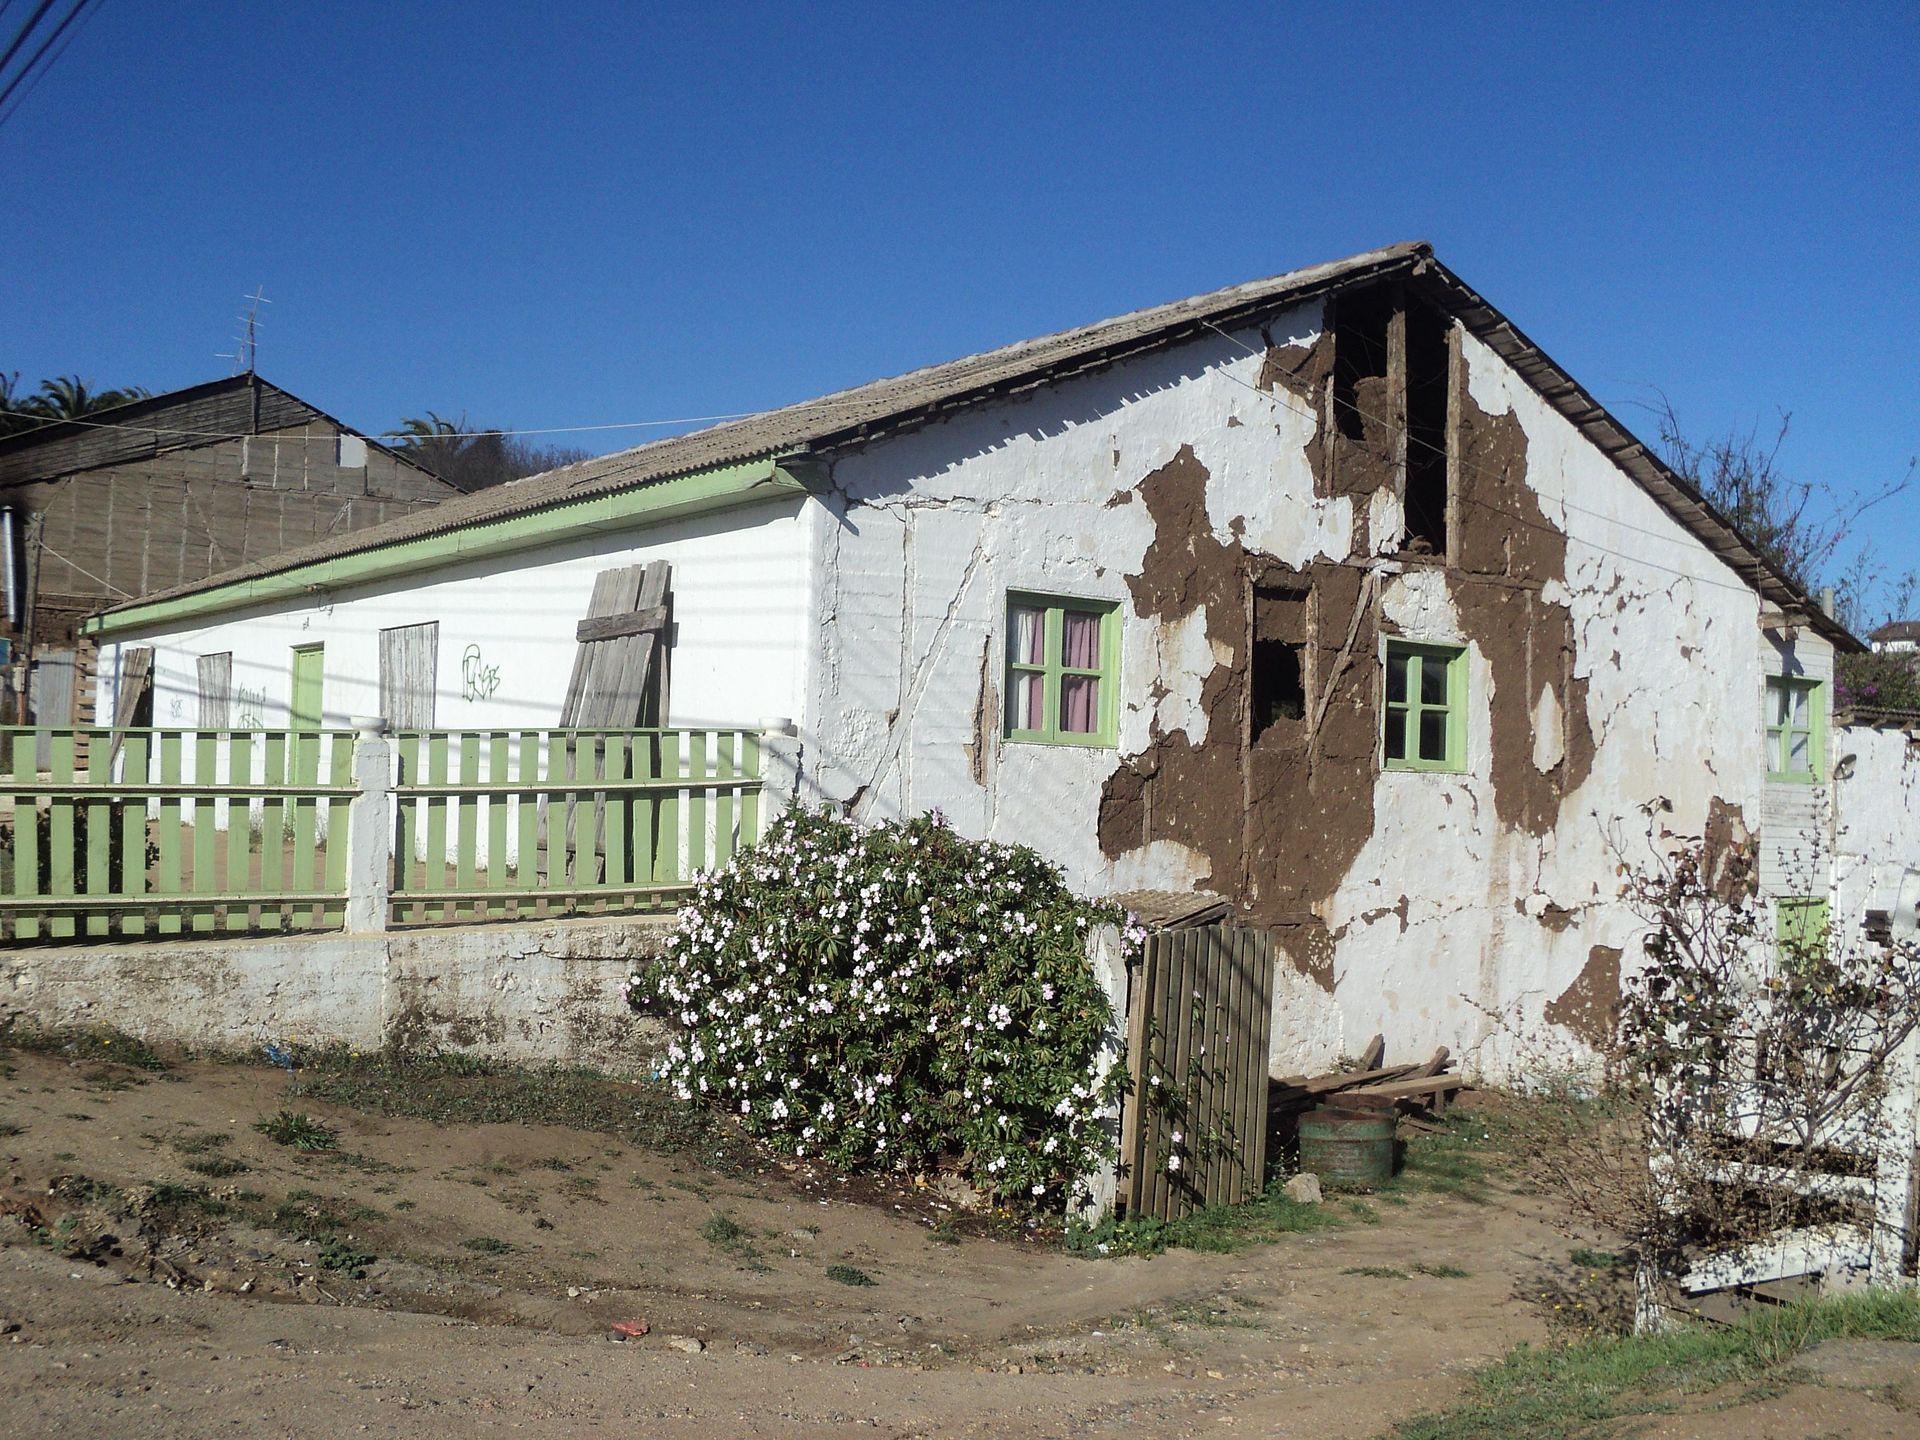 2010 Pichilemu Earthquake Wikipedia